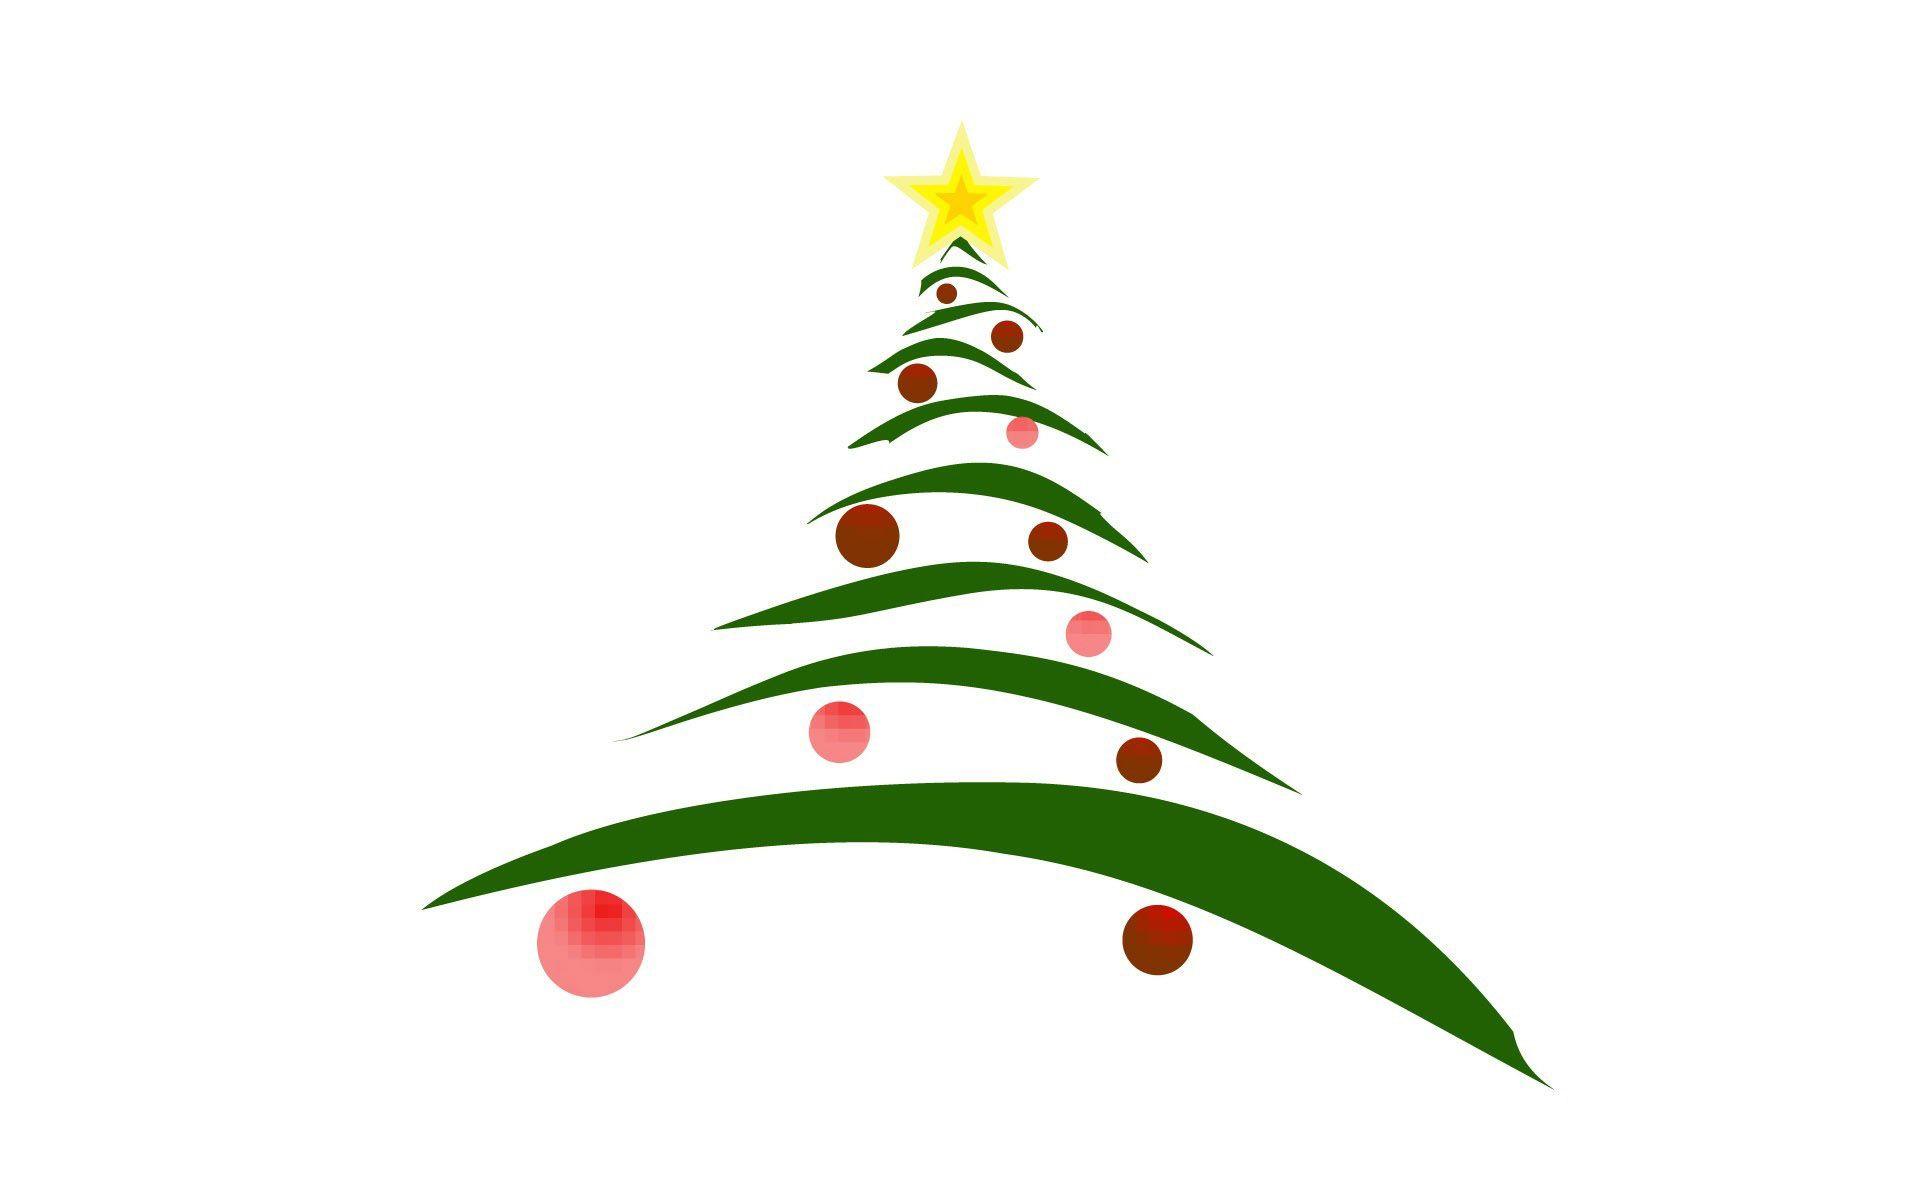 Minimalistic Christmas Tree Christmas Tree Wallpaper Christmas Tree Drawing Watercolor Christmas Tree